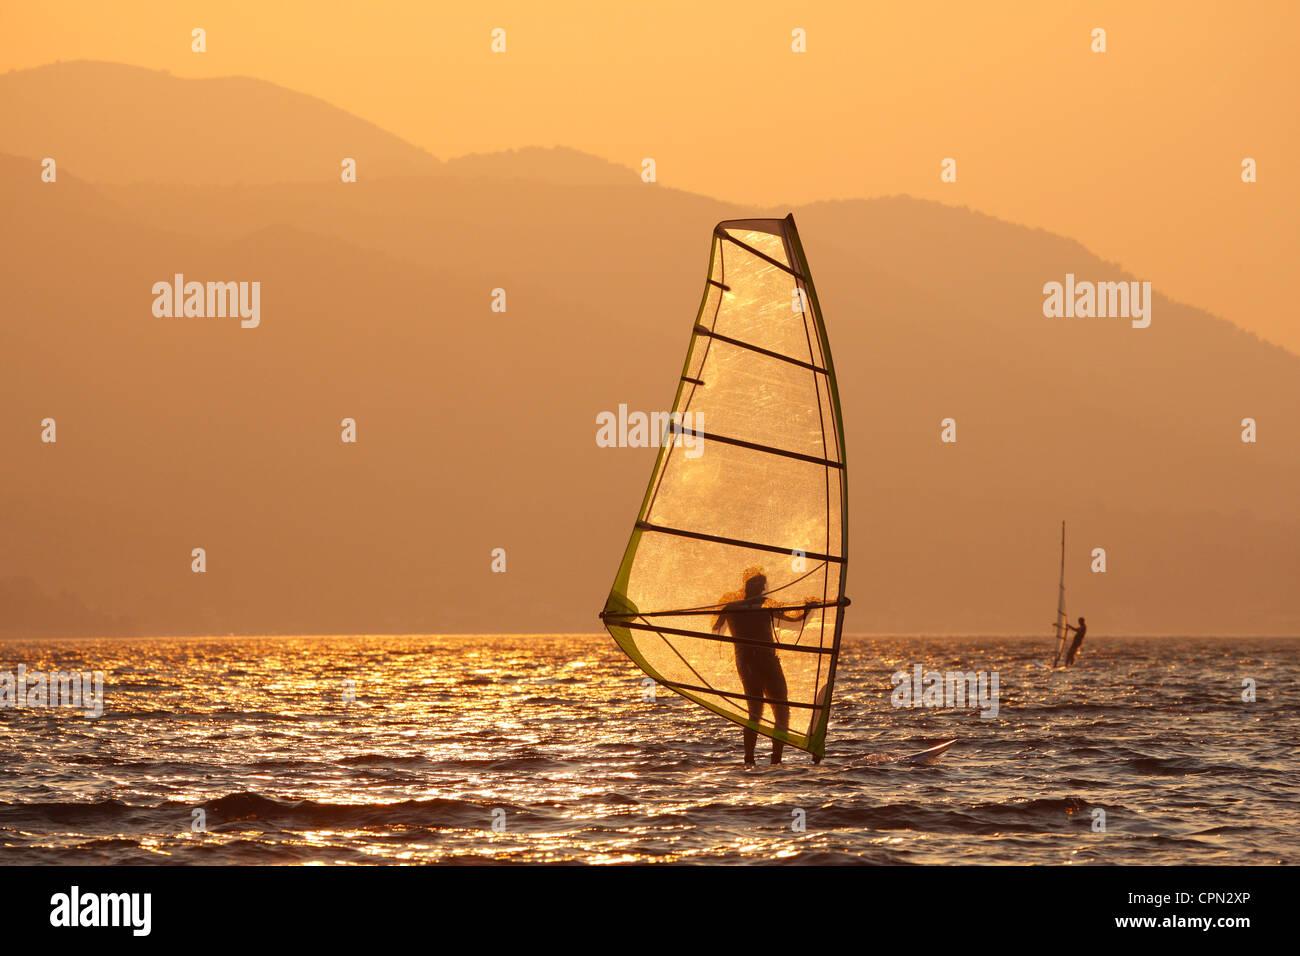 Windsurfing at sunset - Stock Image